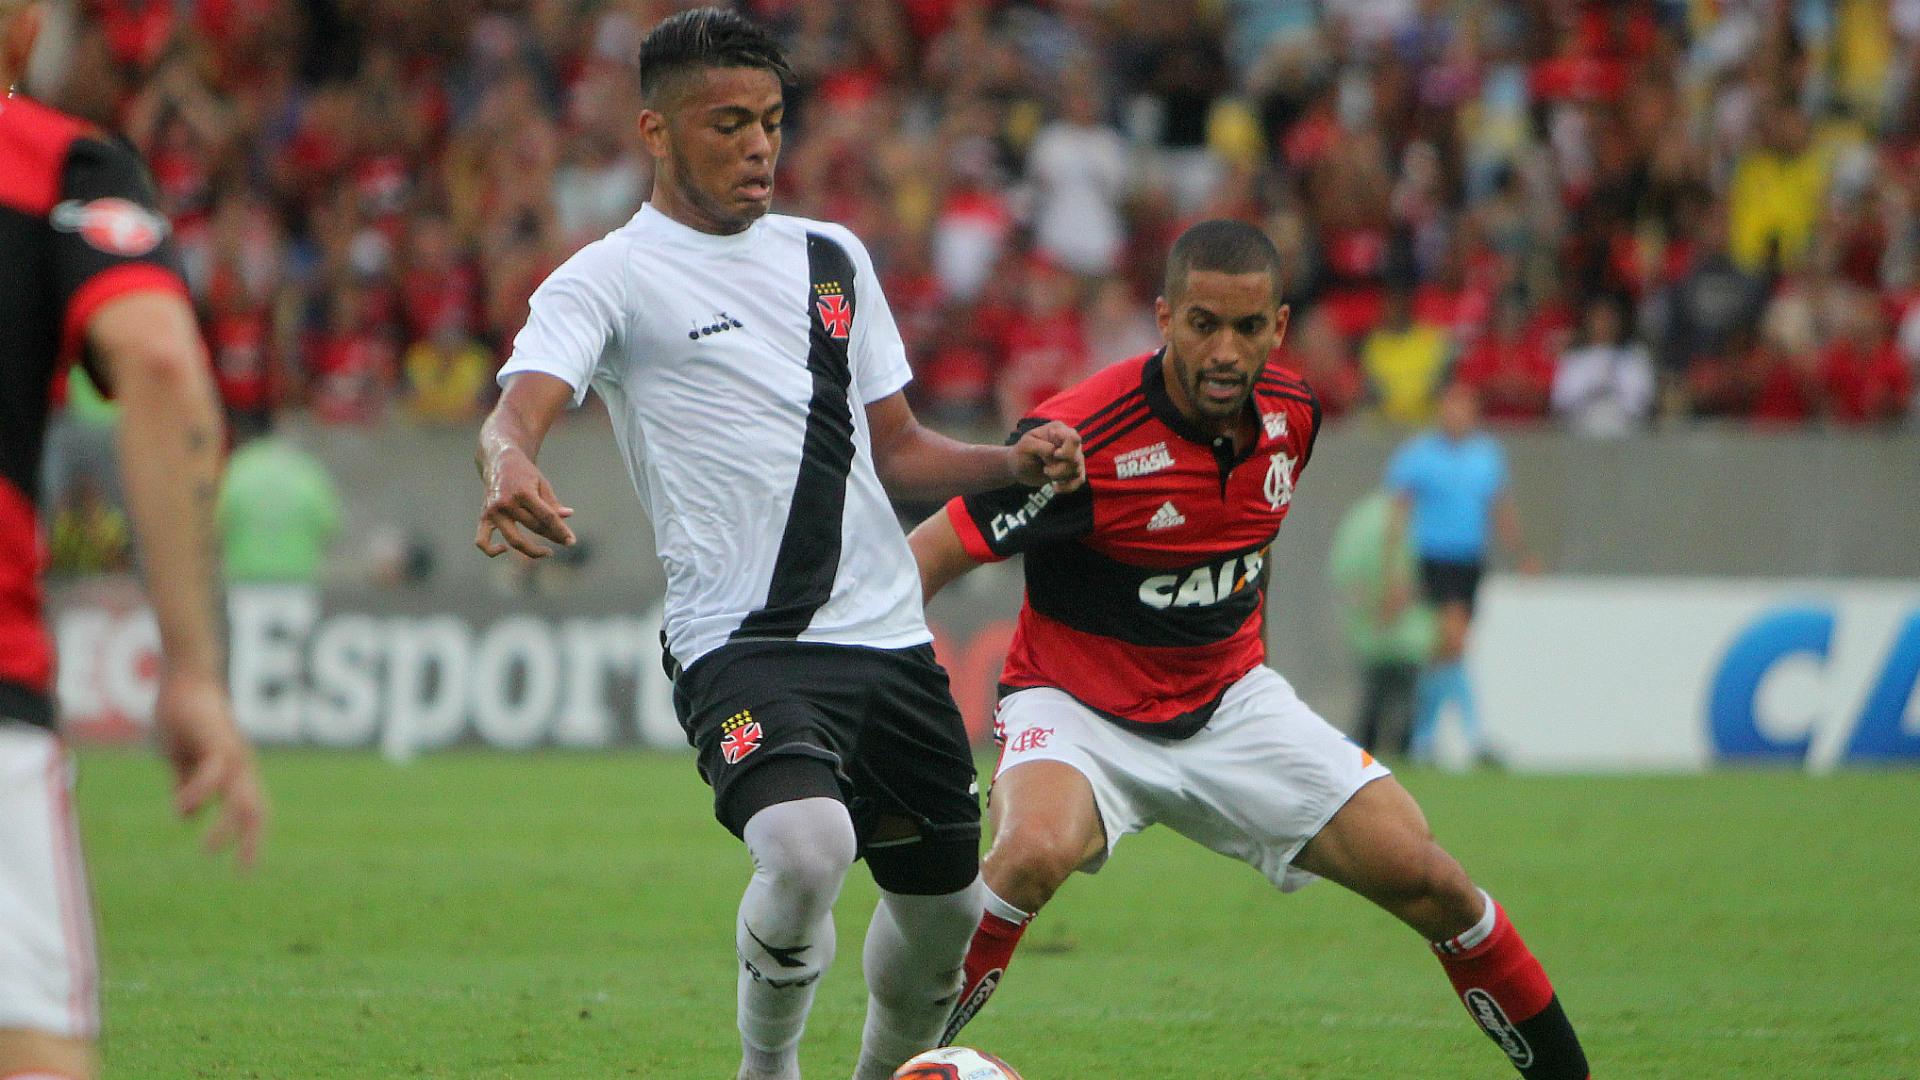 Flamengo x Vasco - 27/01/2018